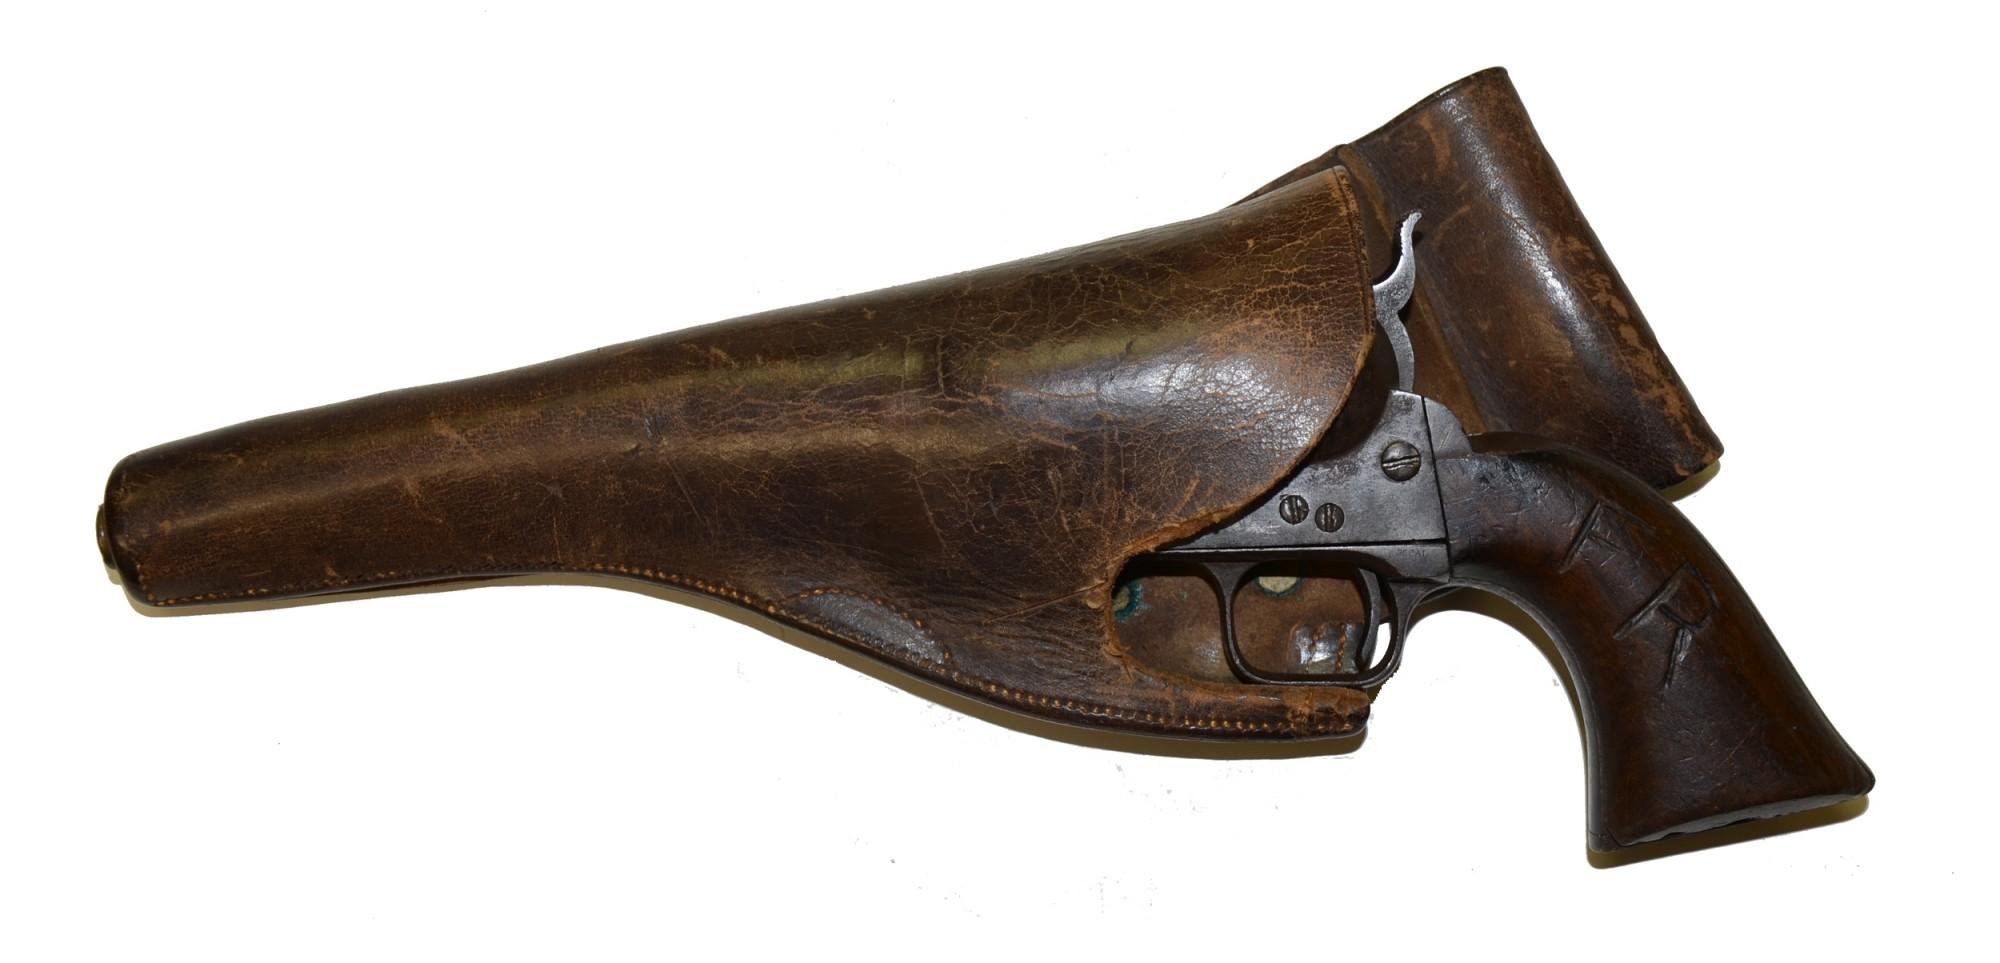 Us Navy Conversion Of The Colt Model 1851 Navy Revolver